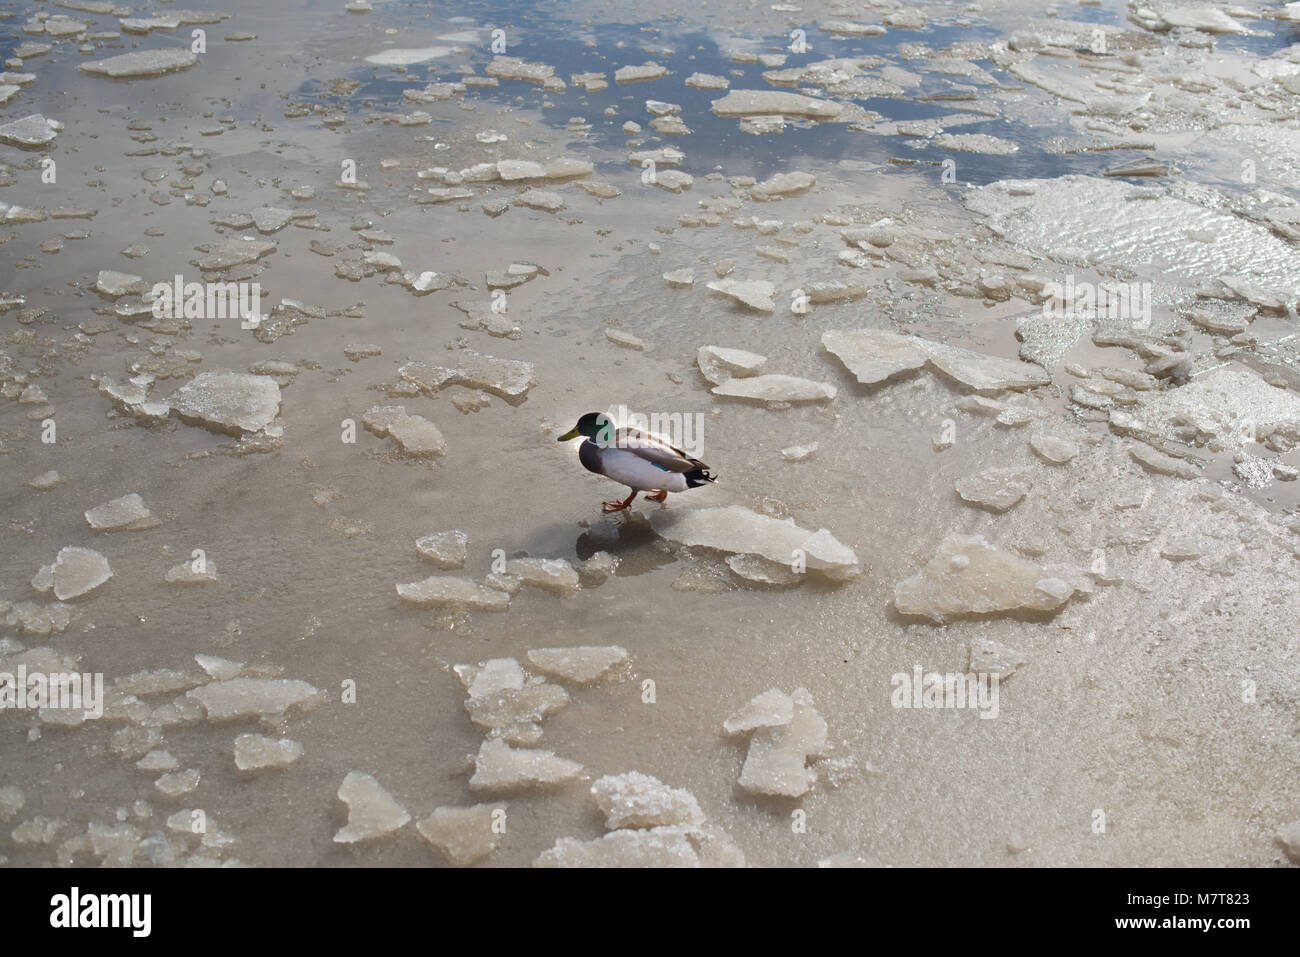 ducks walking on frozen pond wit chuncks of ice on the surface - Stock Image